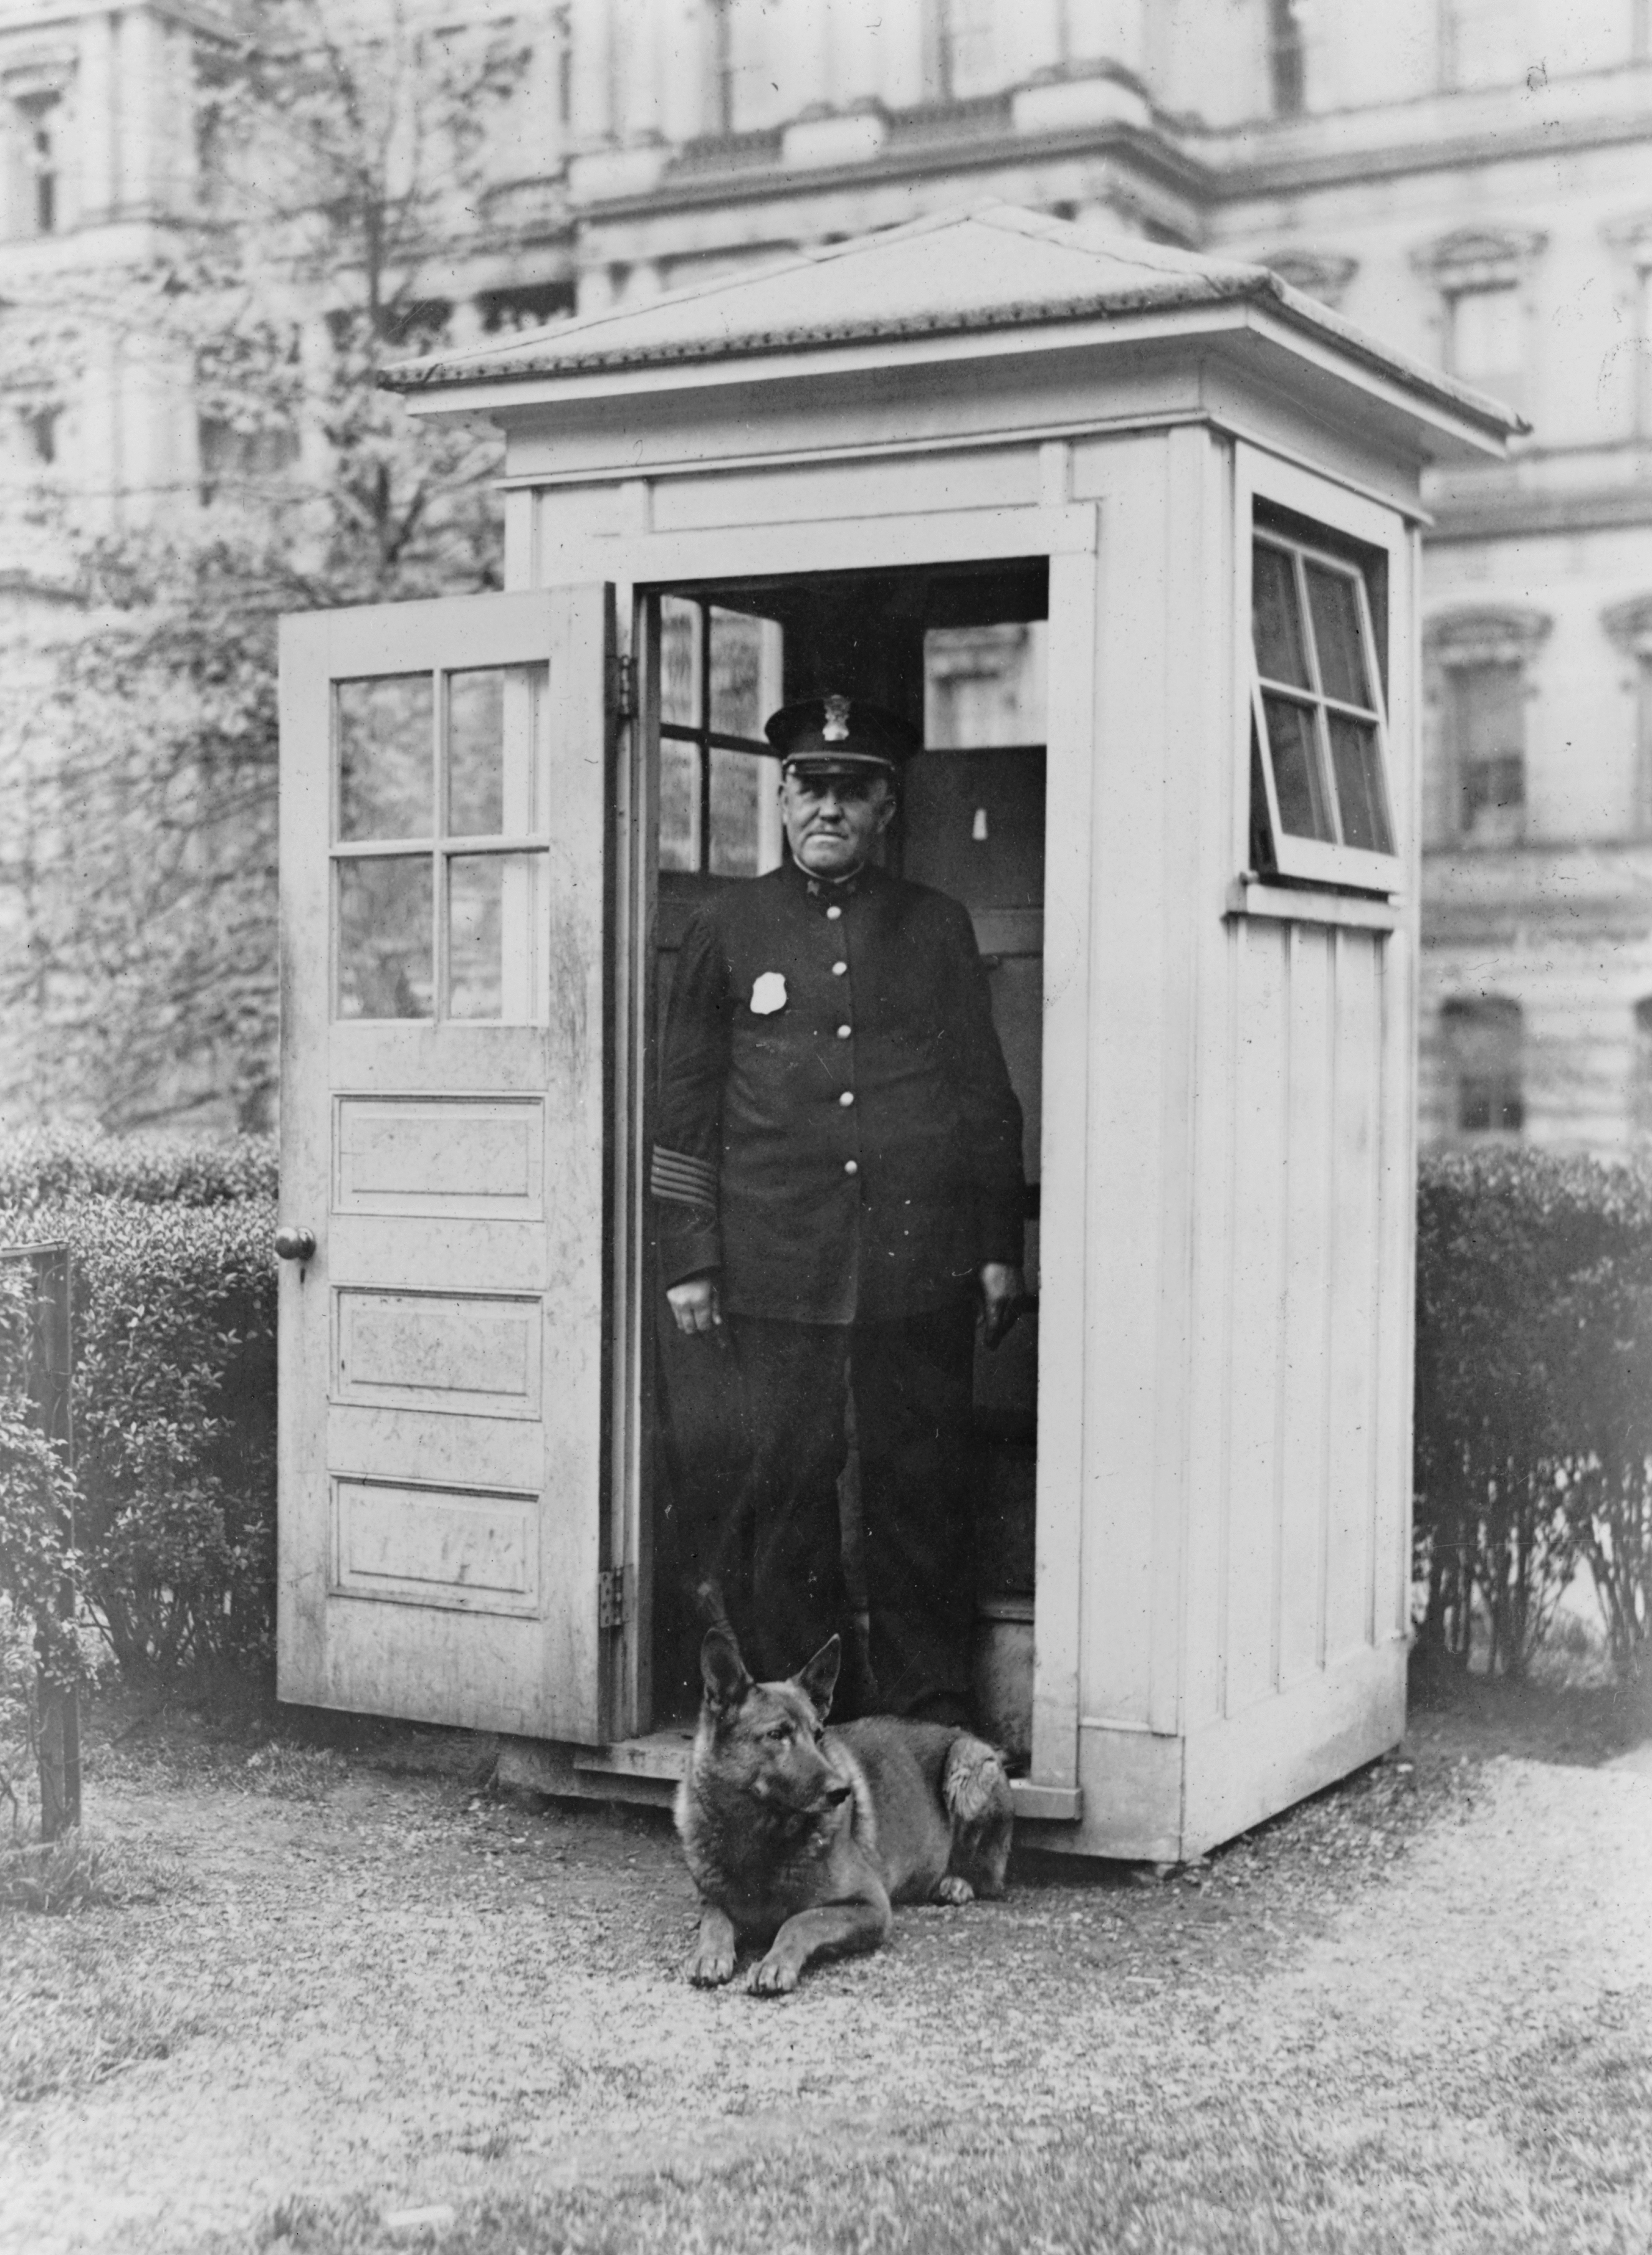 Sentry Box Sentry Box